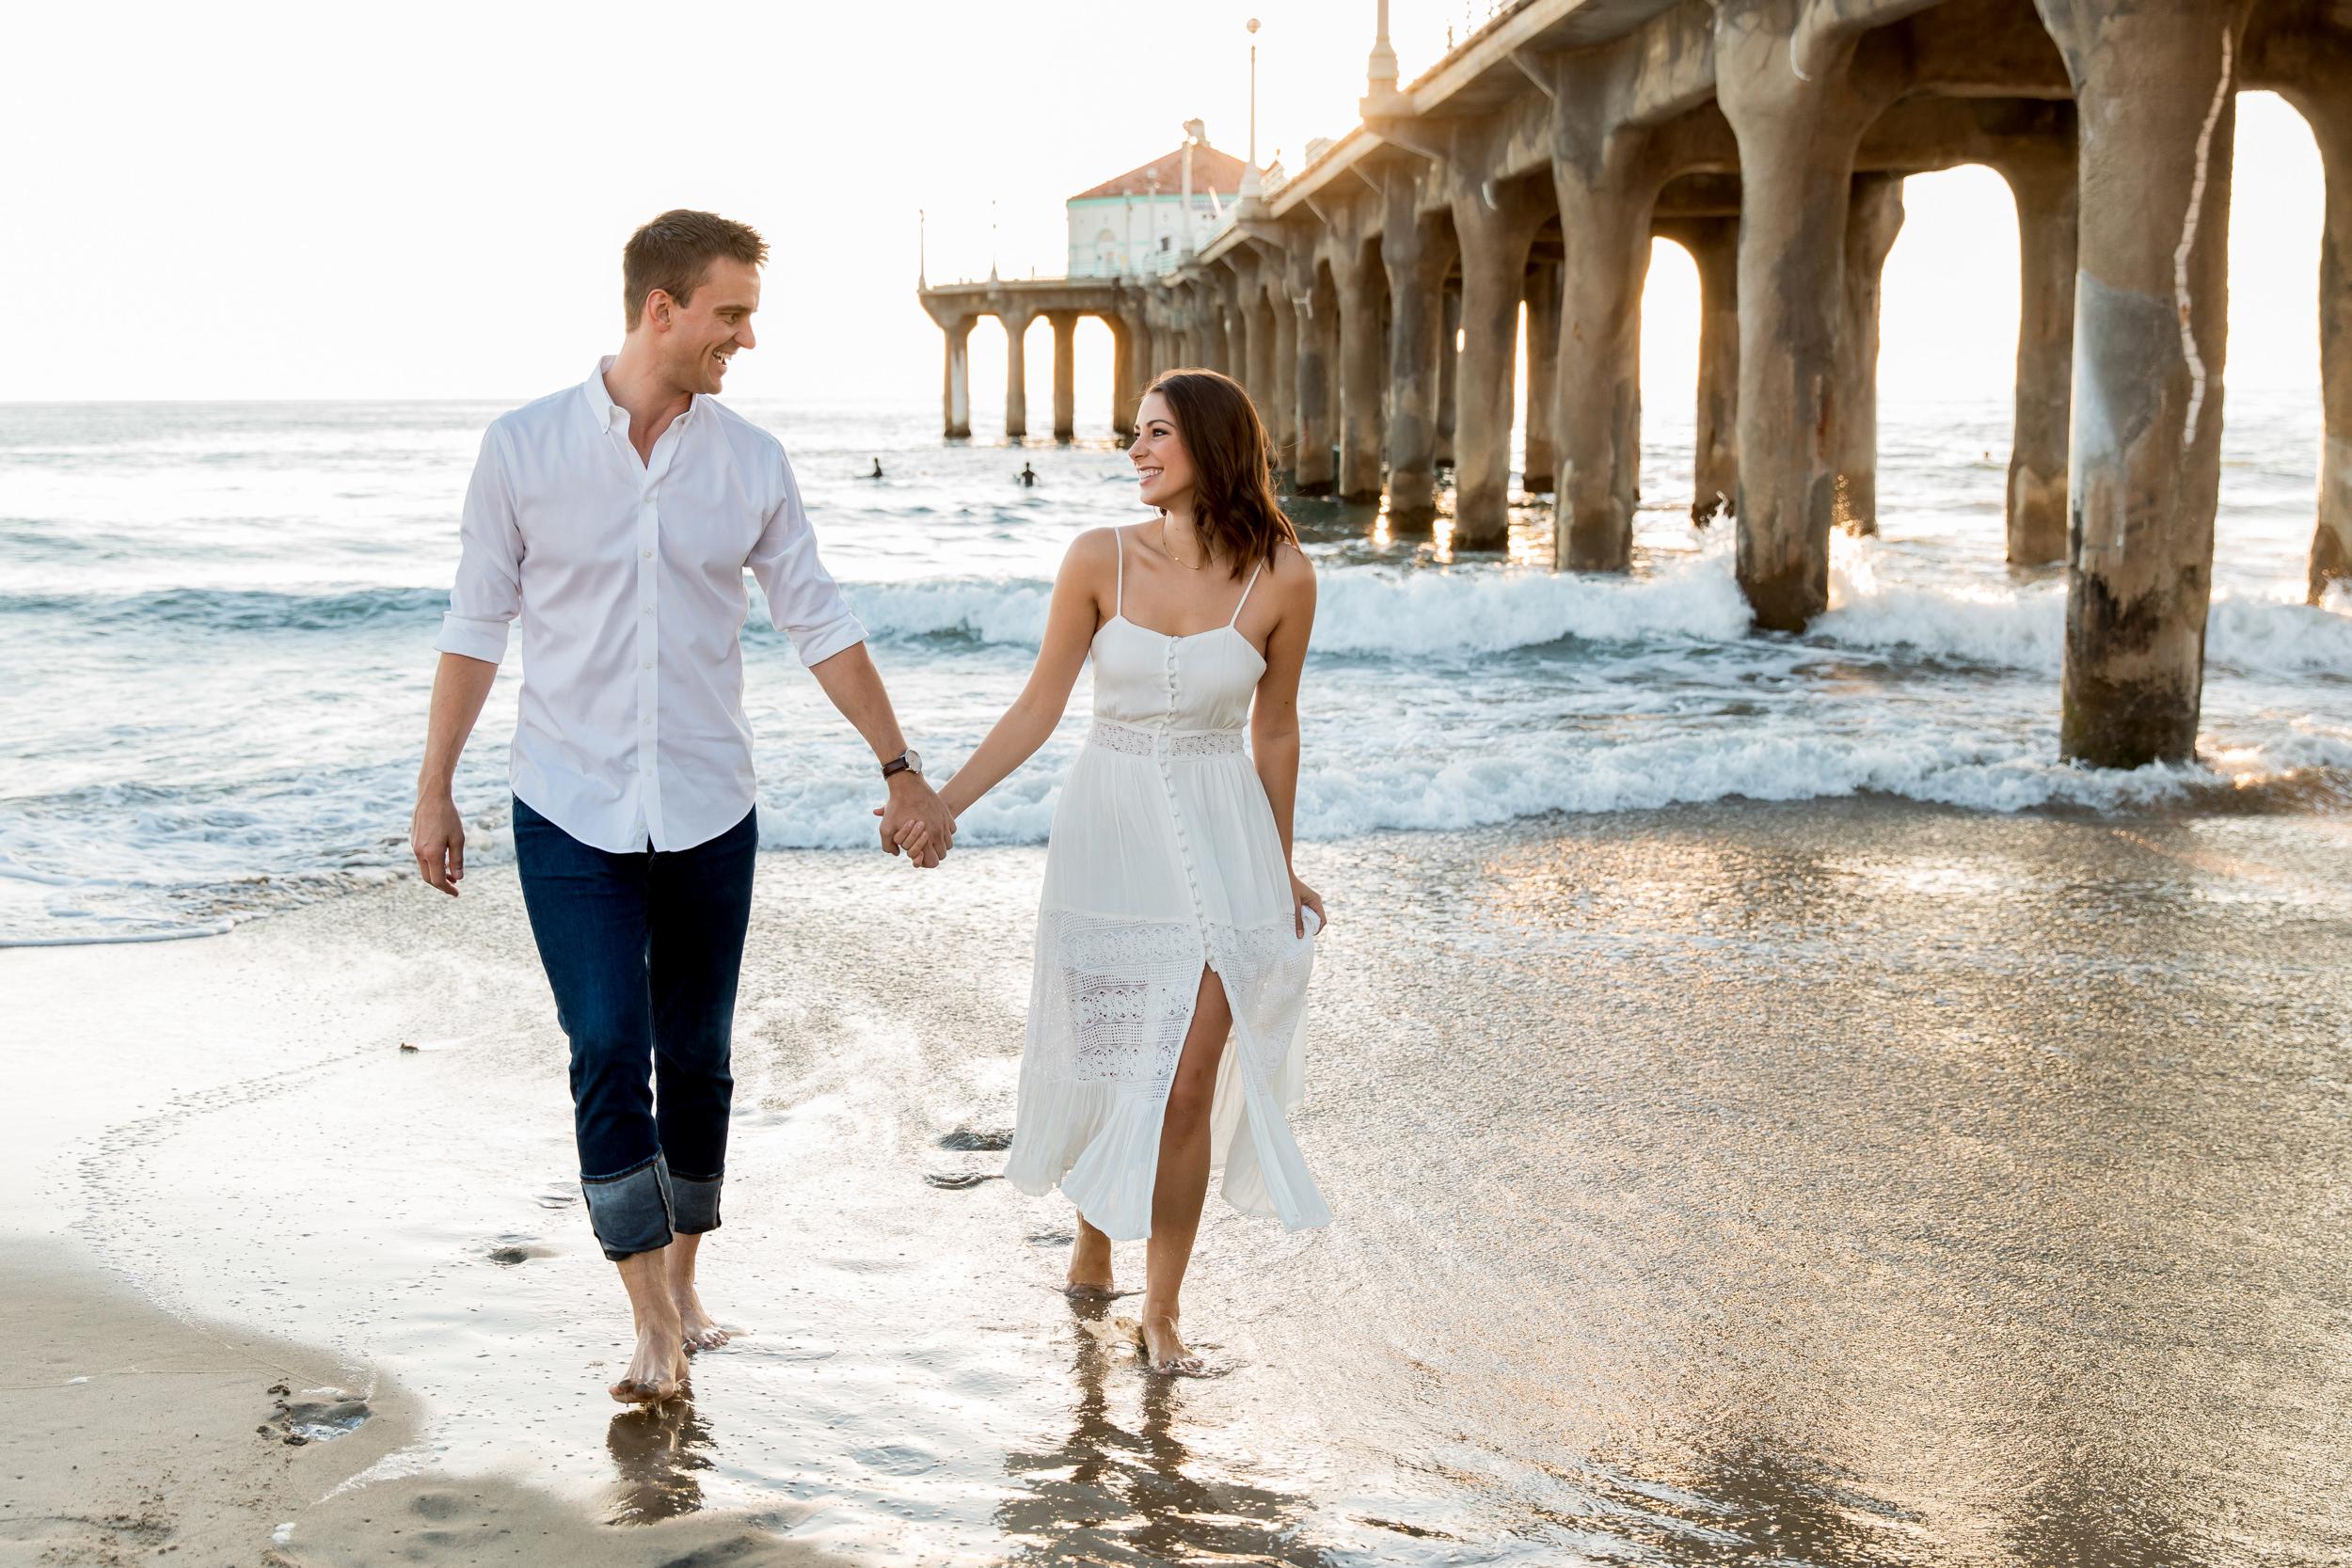 A couple walks on a California beach with the pier behind them